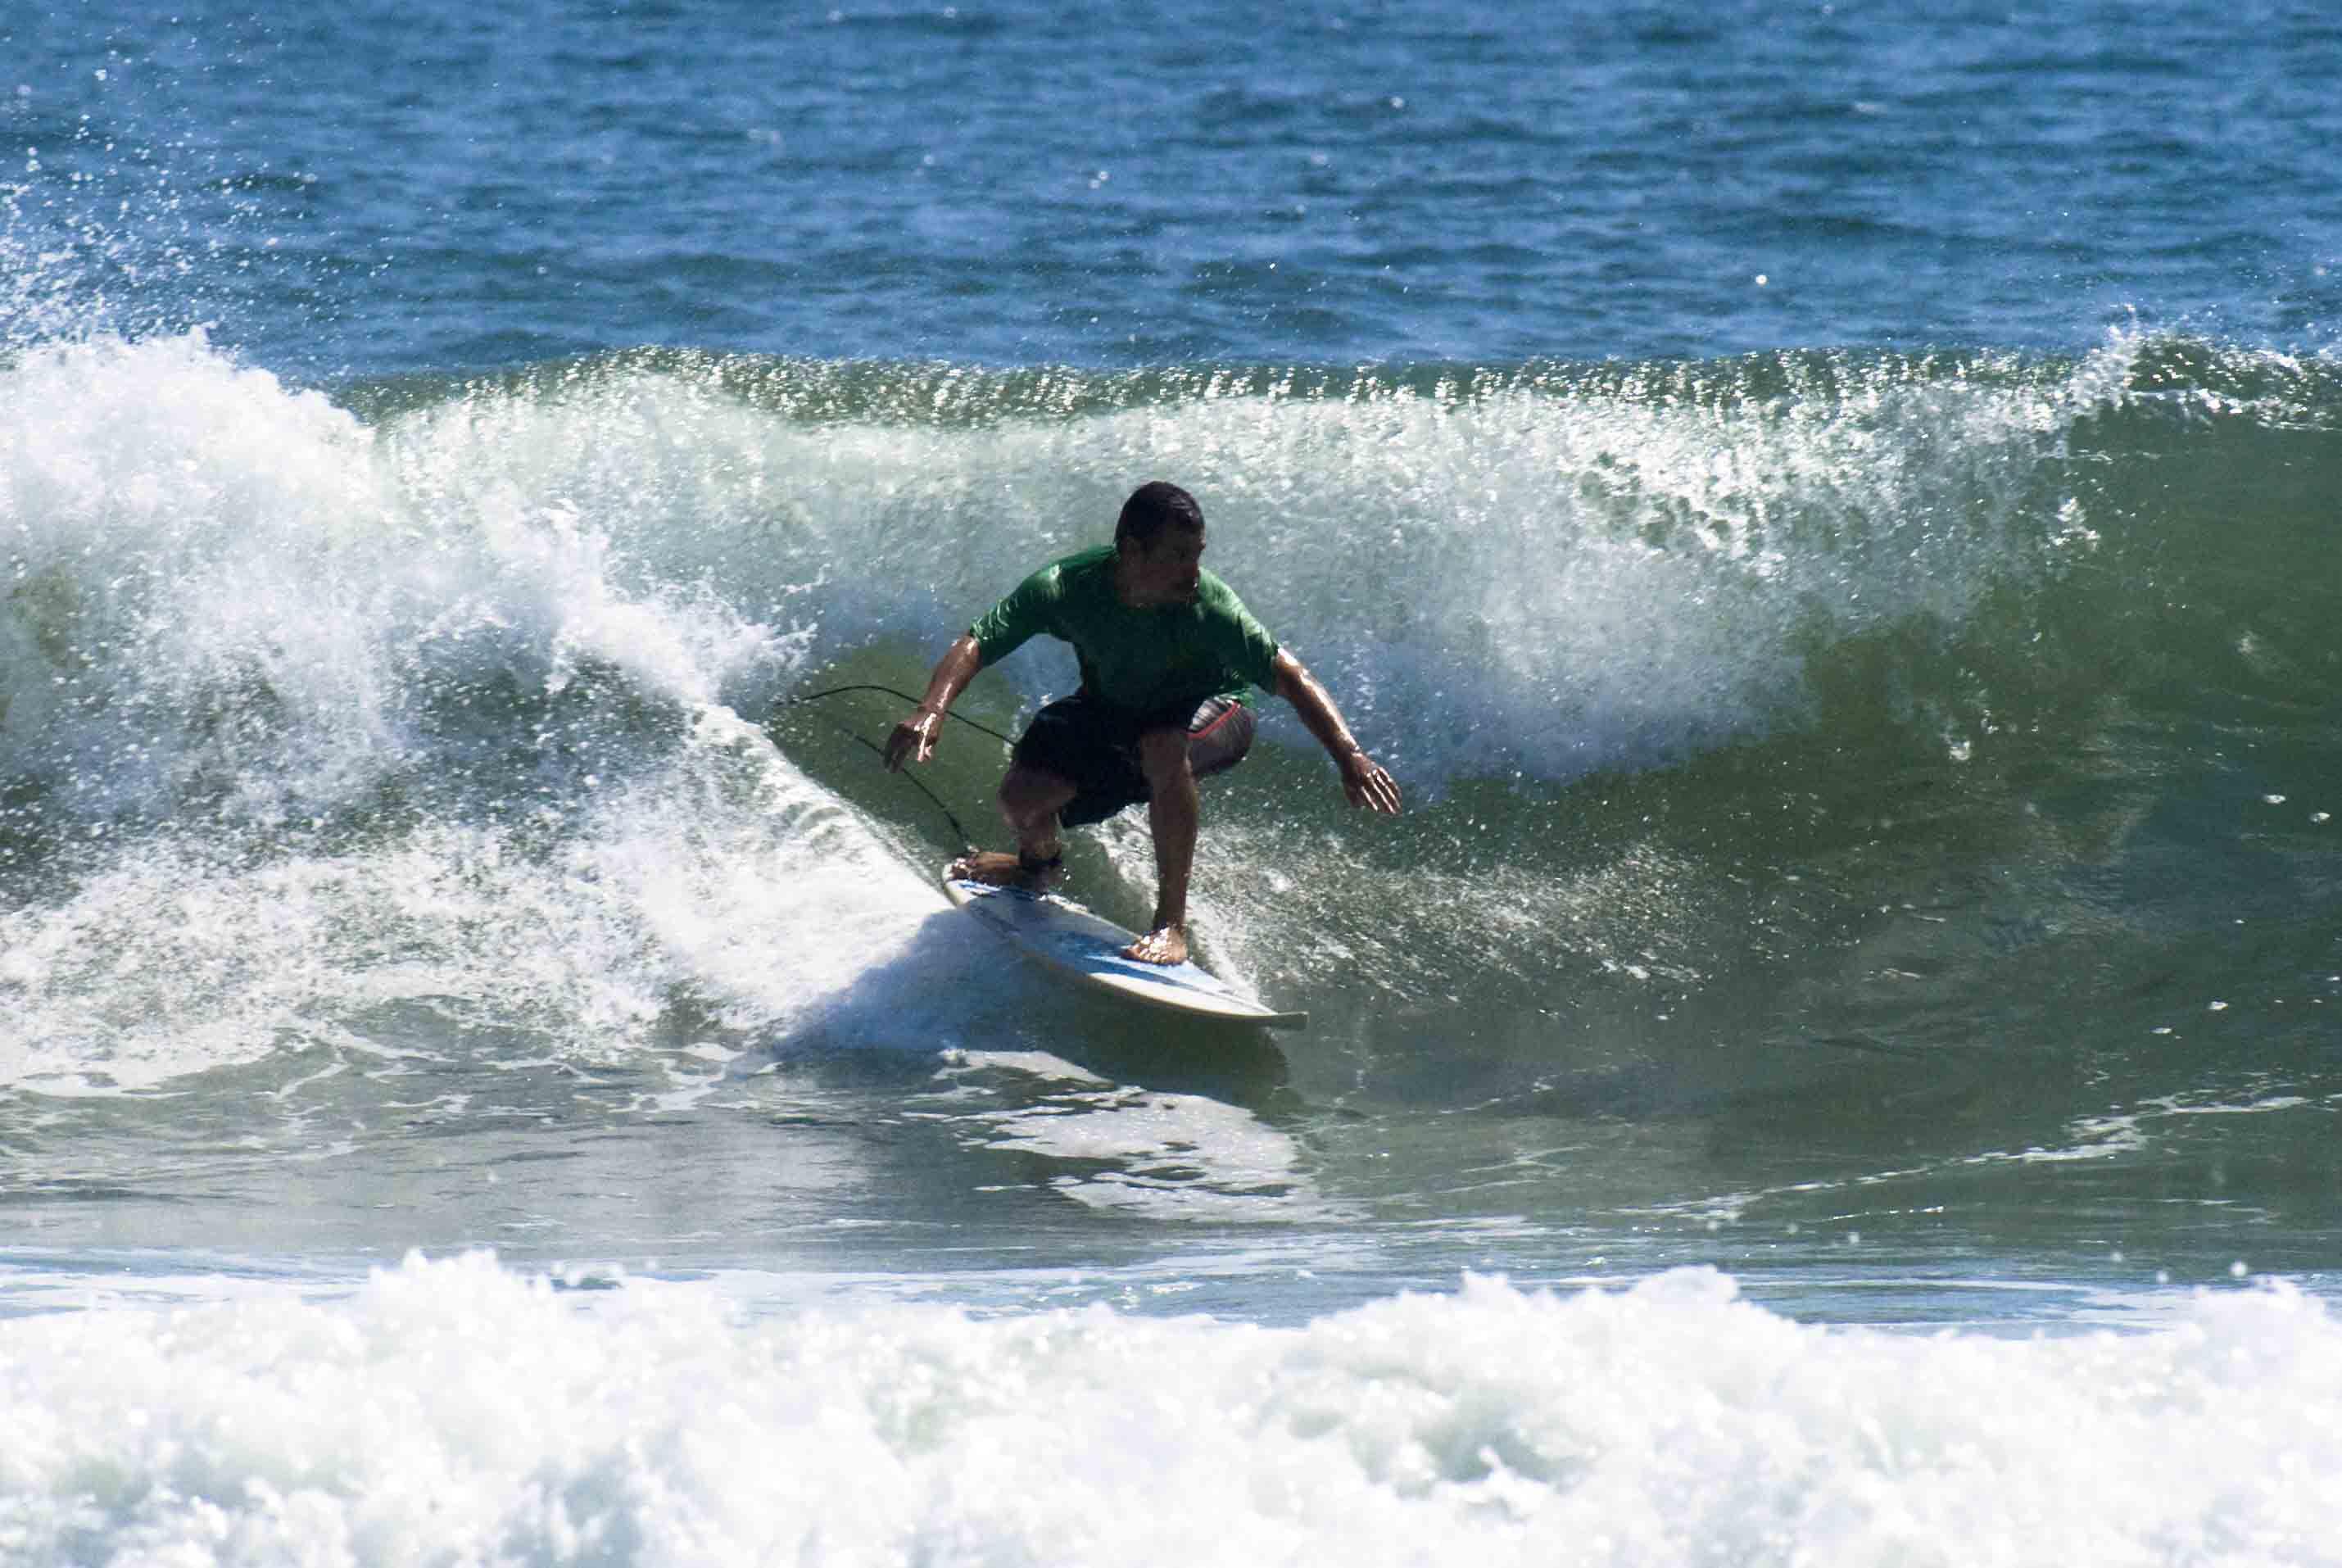 Rockaway Beach surfing